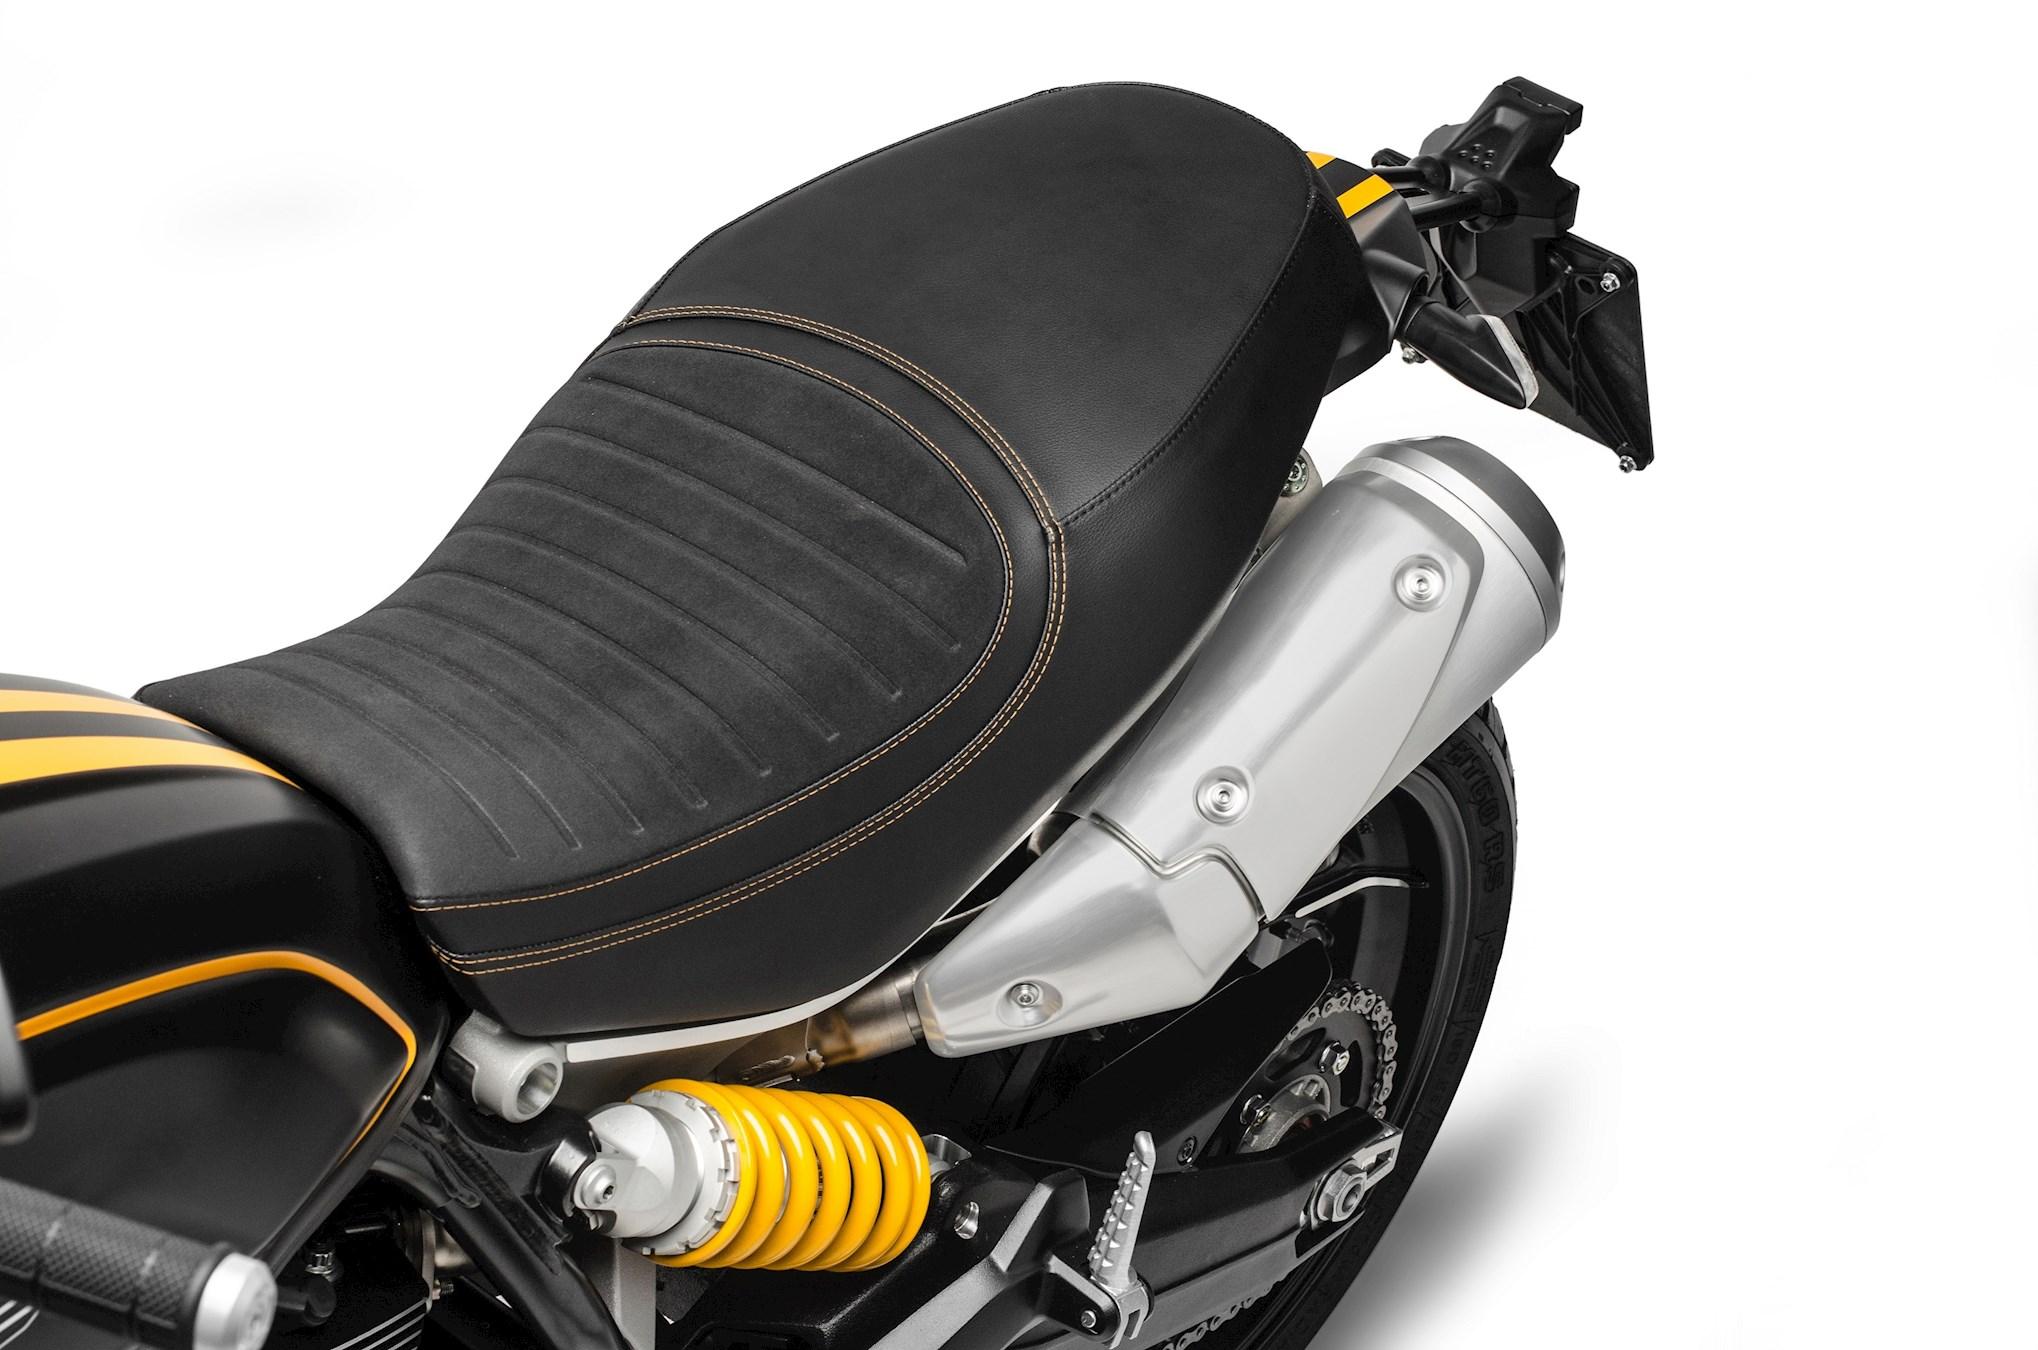 МОТОЦИКЛ DUCATI SCRAMBLER 1100 SPORT  Артмото - купить квадроцикл в украине и харькове, мотоцикл, снегоход, скутер, мопед, электромобиль